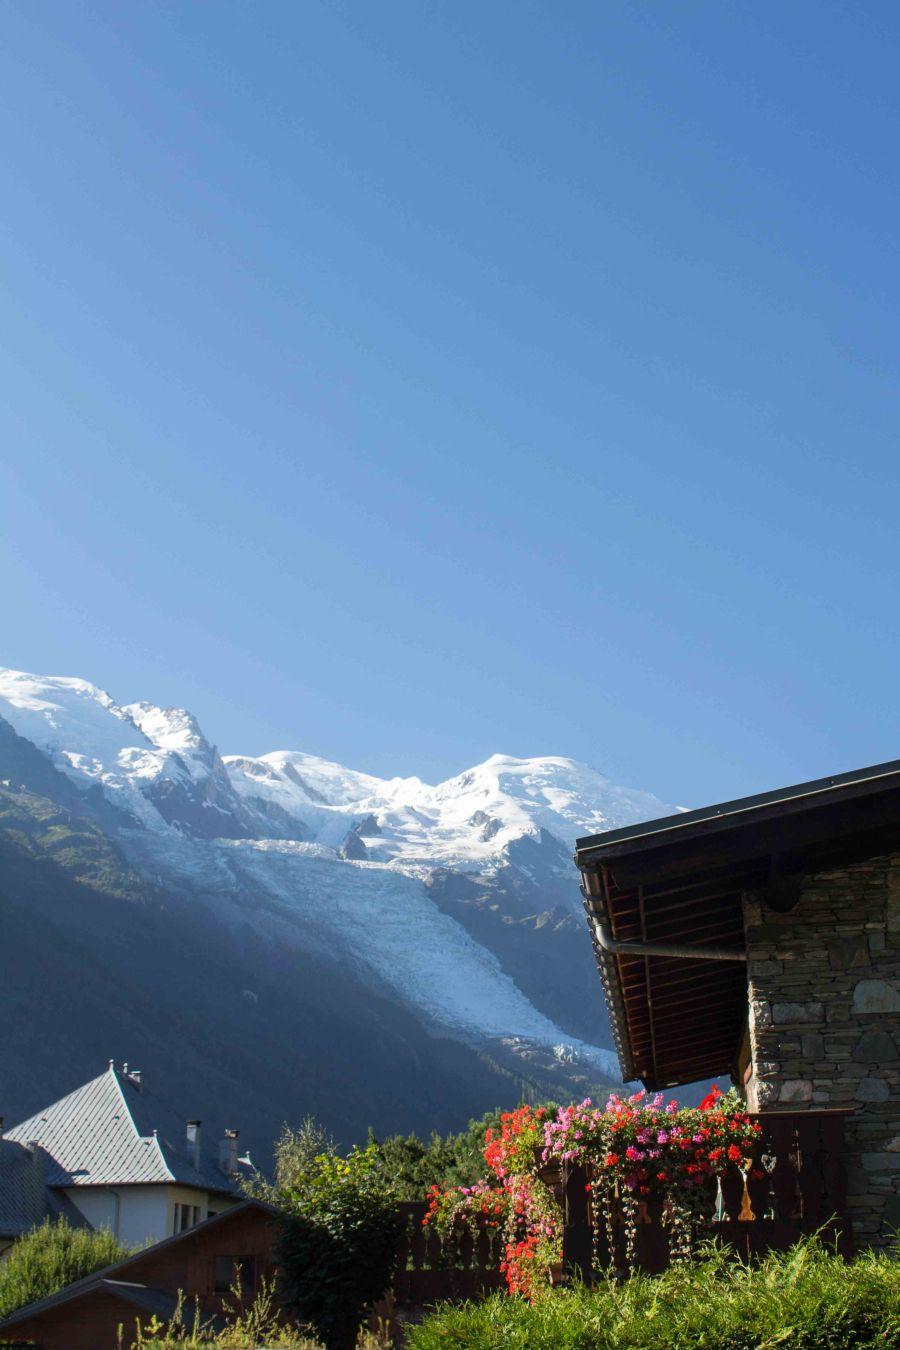 A few of my favorite things about Chamonix!